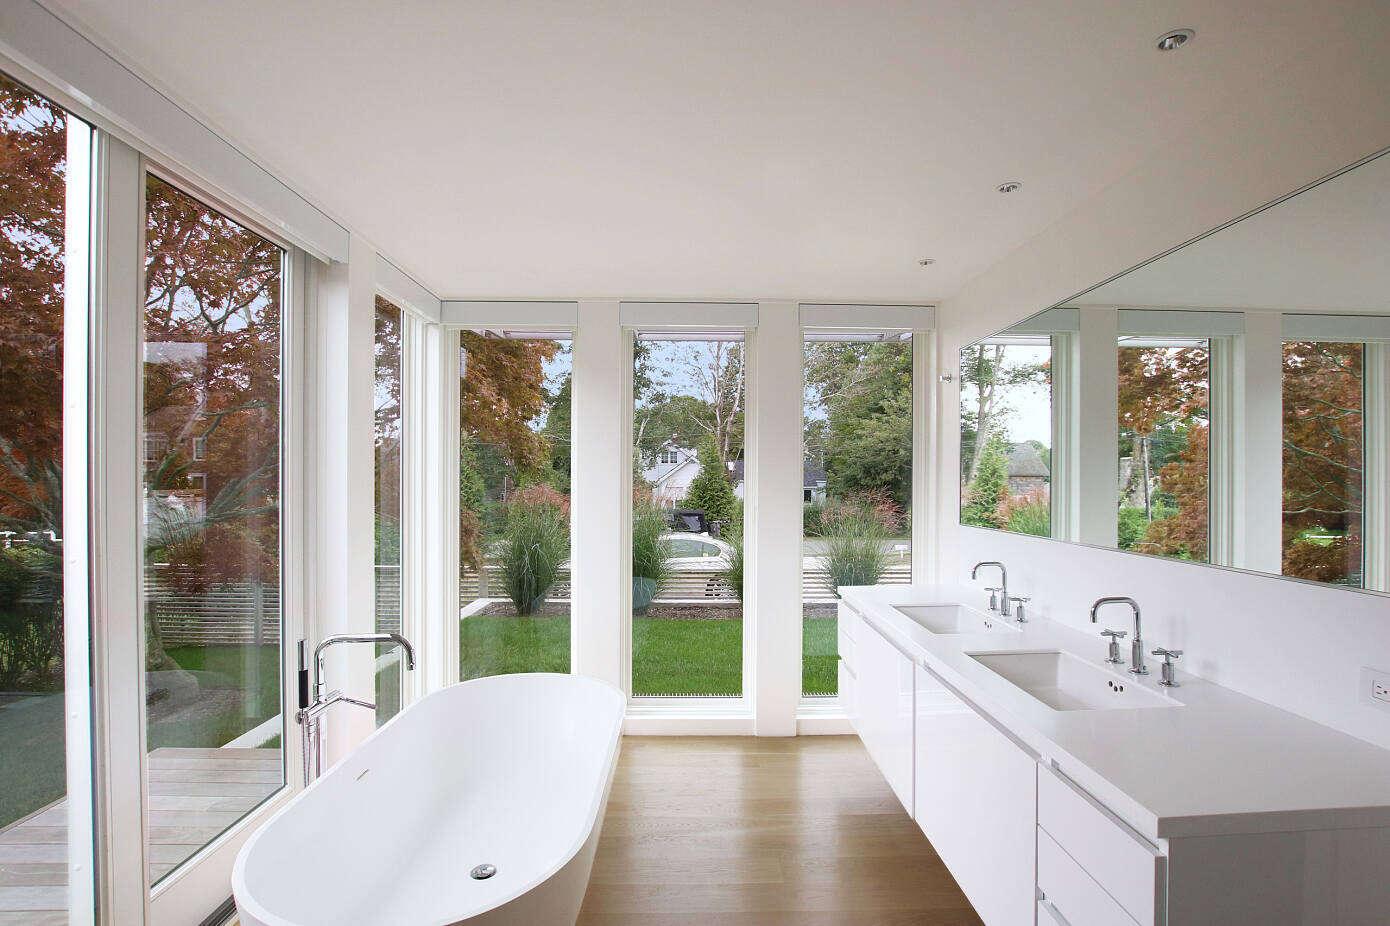 Bridgehampton House by Resolution: 4 Architecture